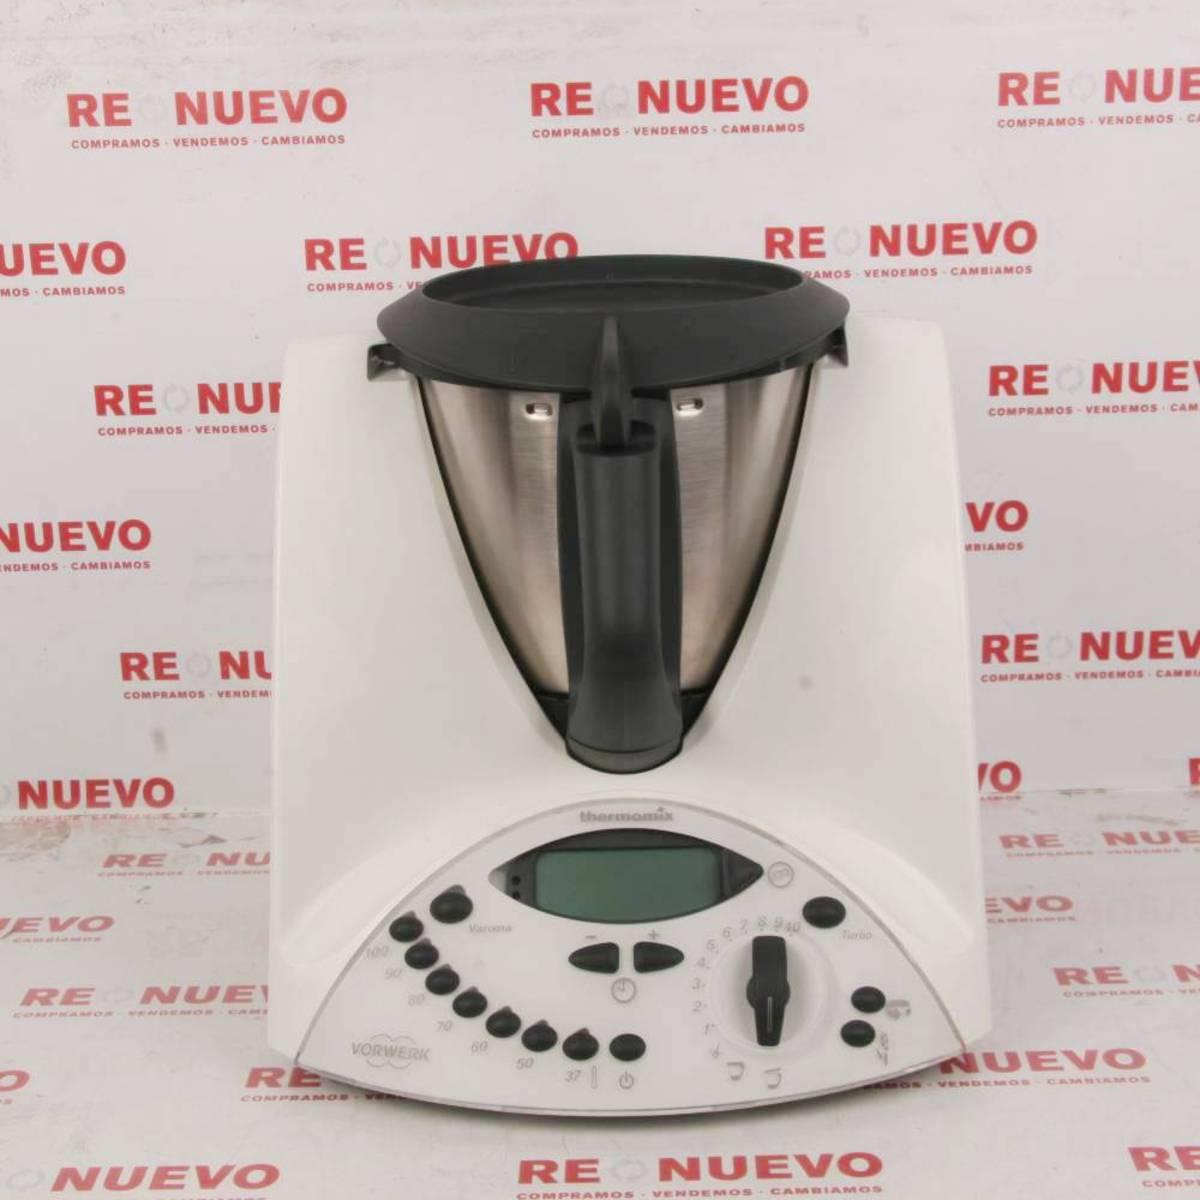 Genial robot cocina thermomix precio fotos receta de - Comprar thermomix corte ingles ...